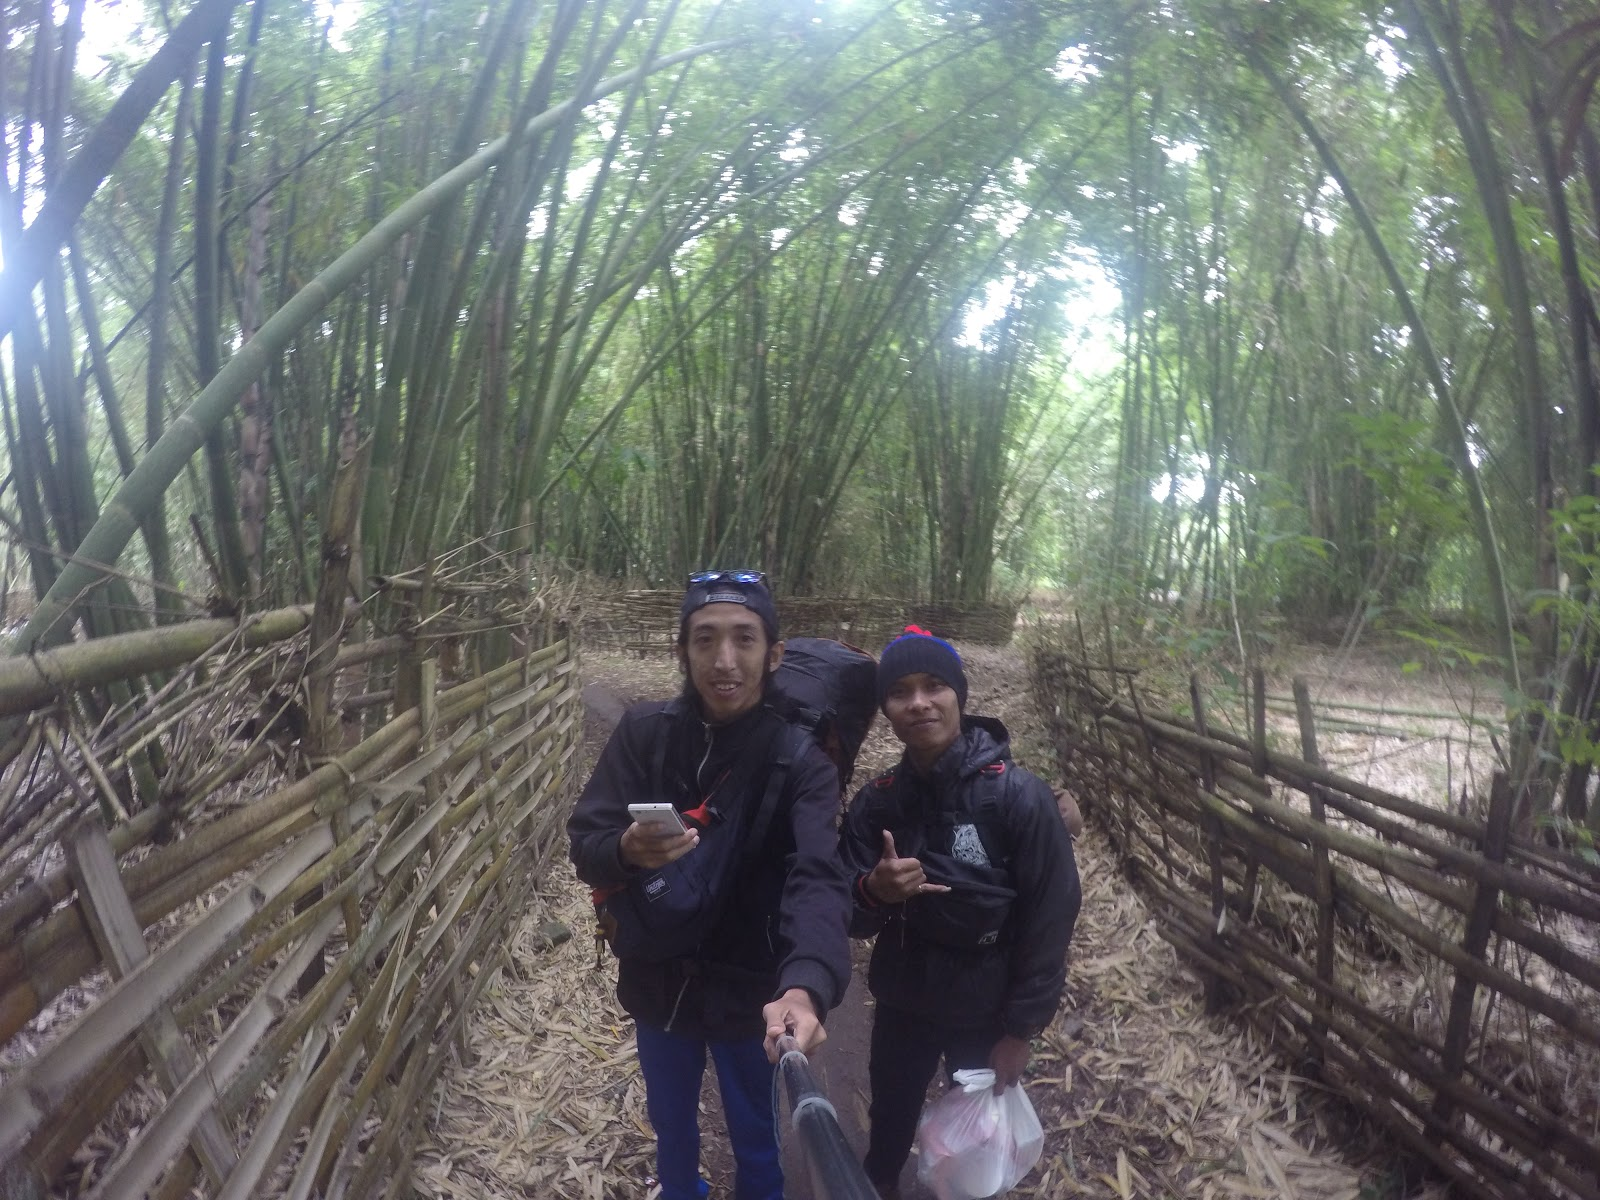 Wisata Pulau Lombok Trekking Bukit Nanggi Sembalun Timur Kedua Melewati